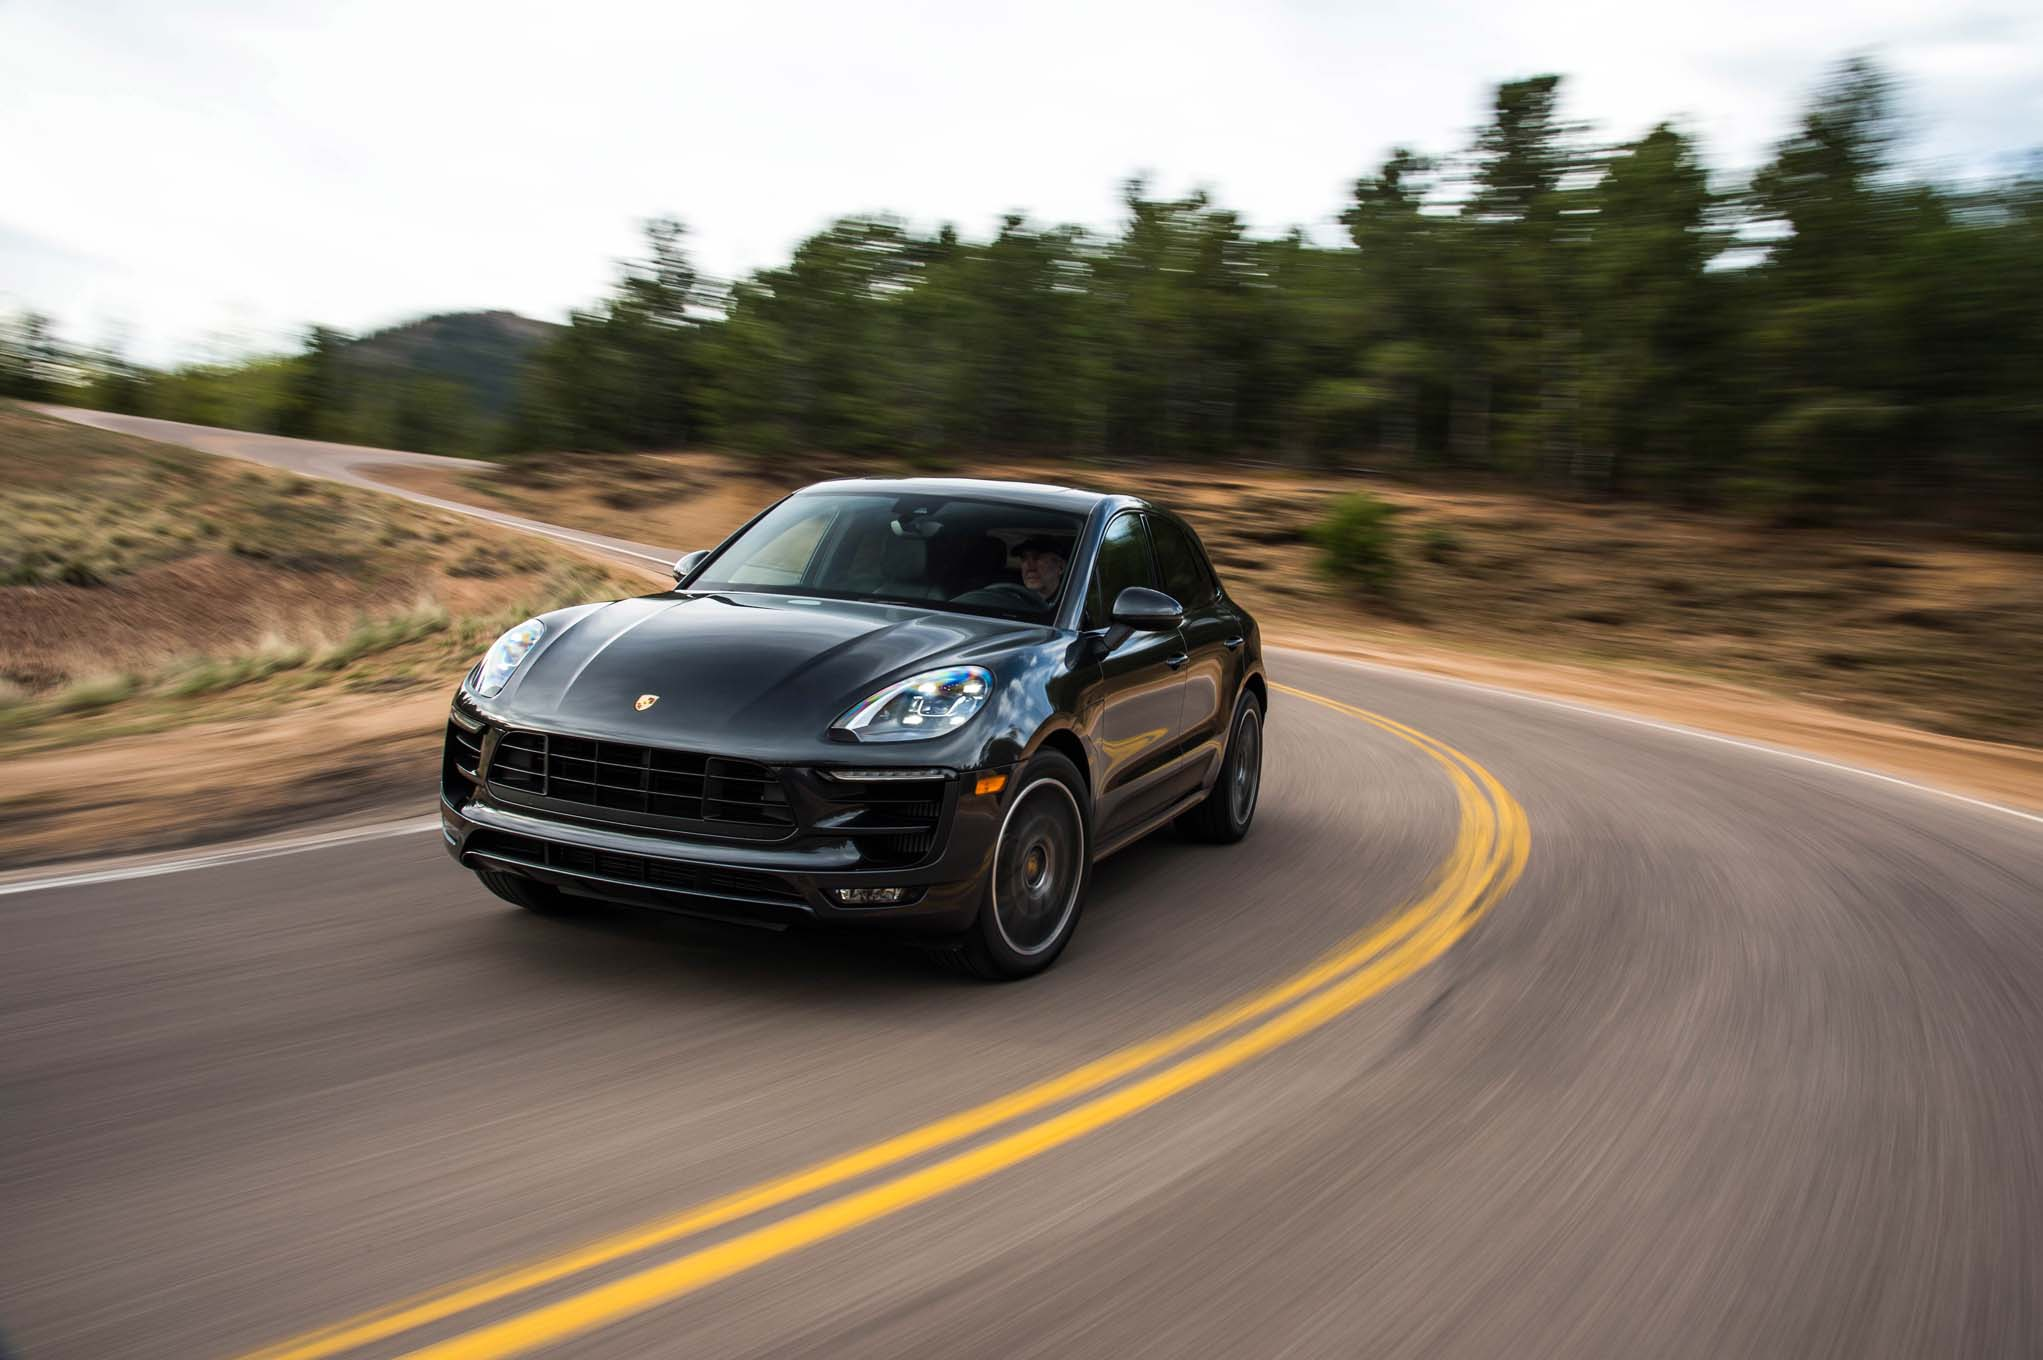 2017 Porsche Macan GTS Front Three Quarter In Motion 05